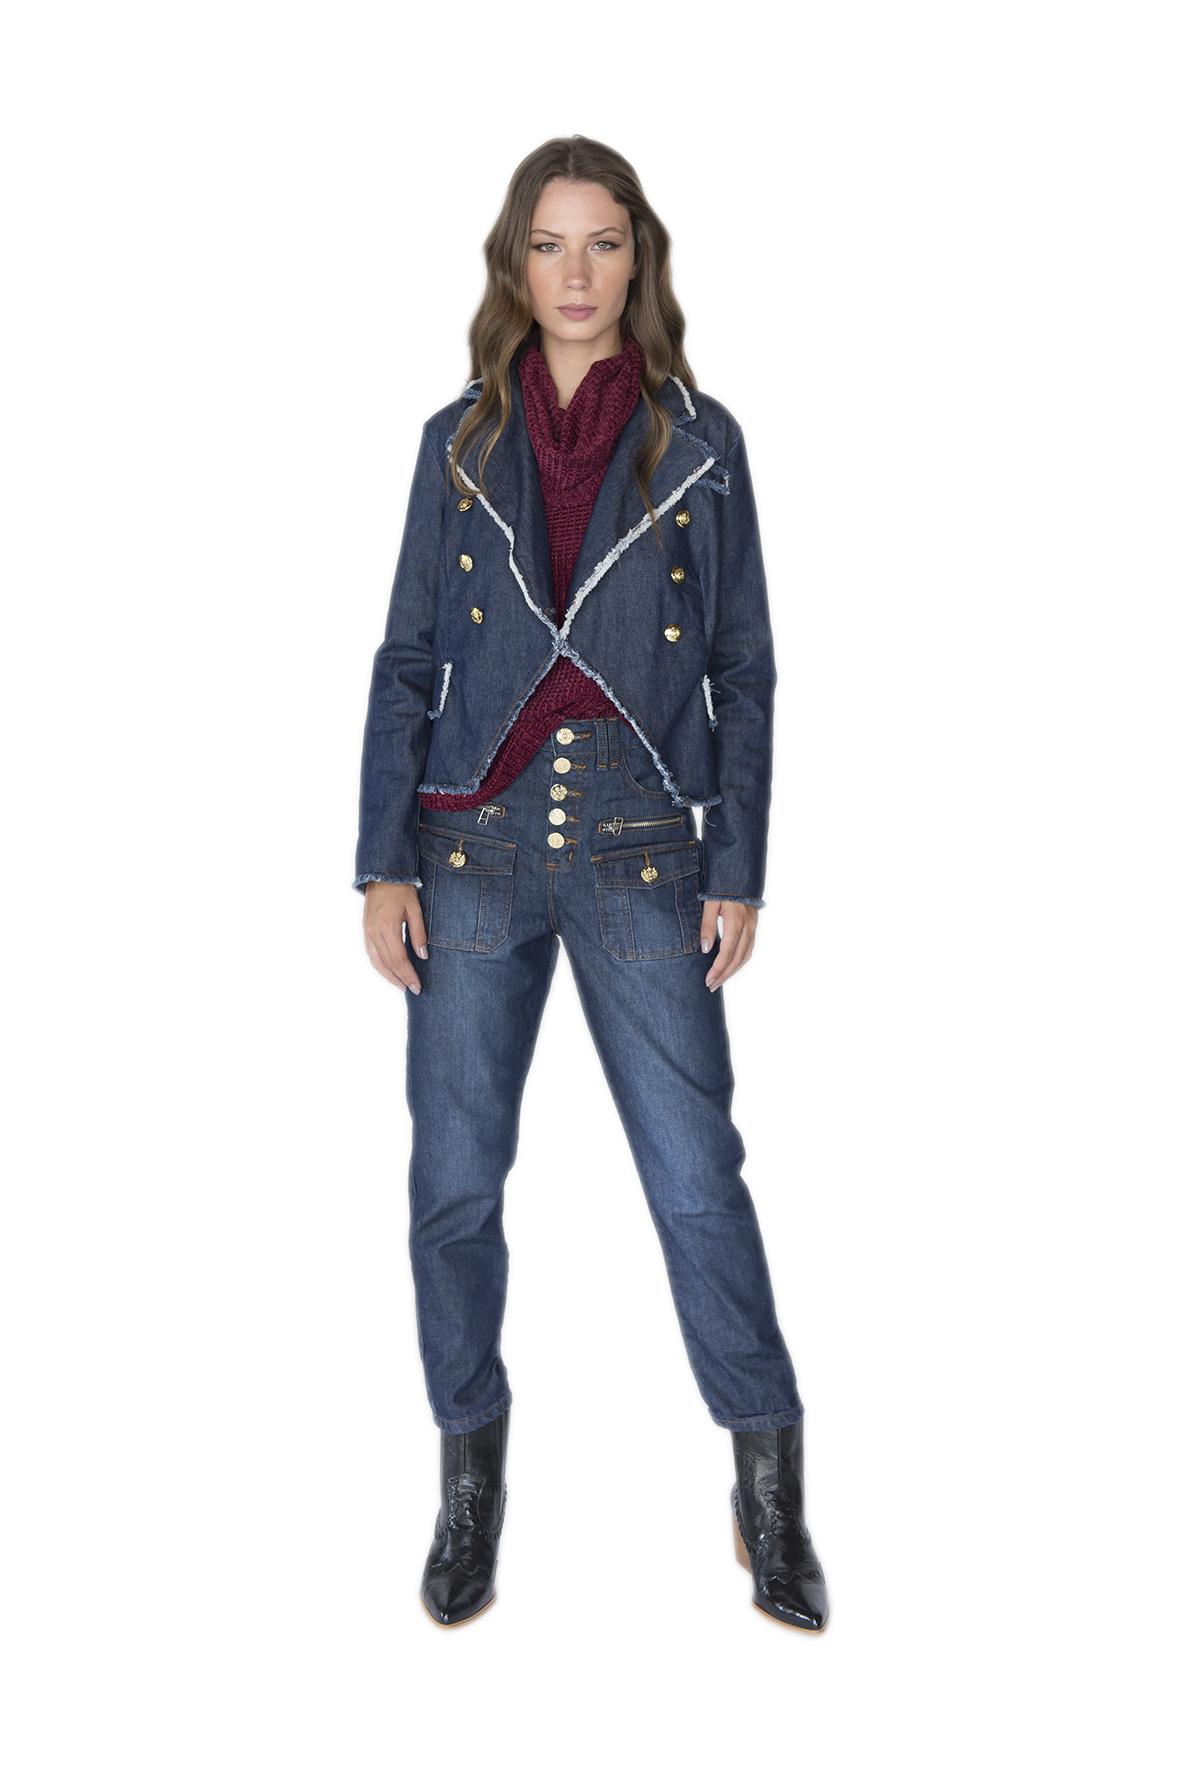 Tee Match - blazer dark jeans desfiado